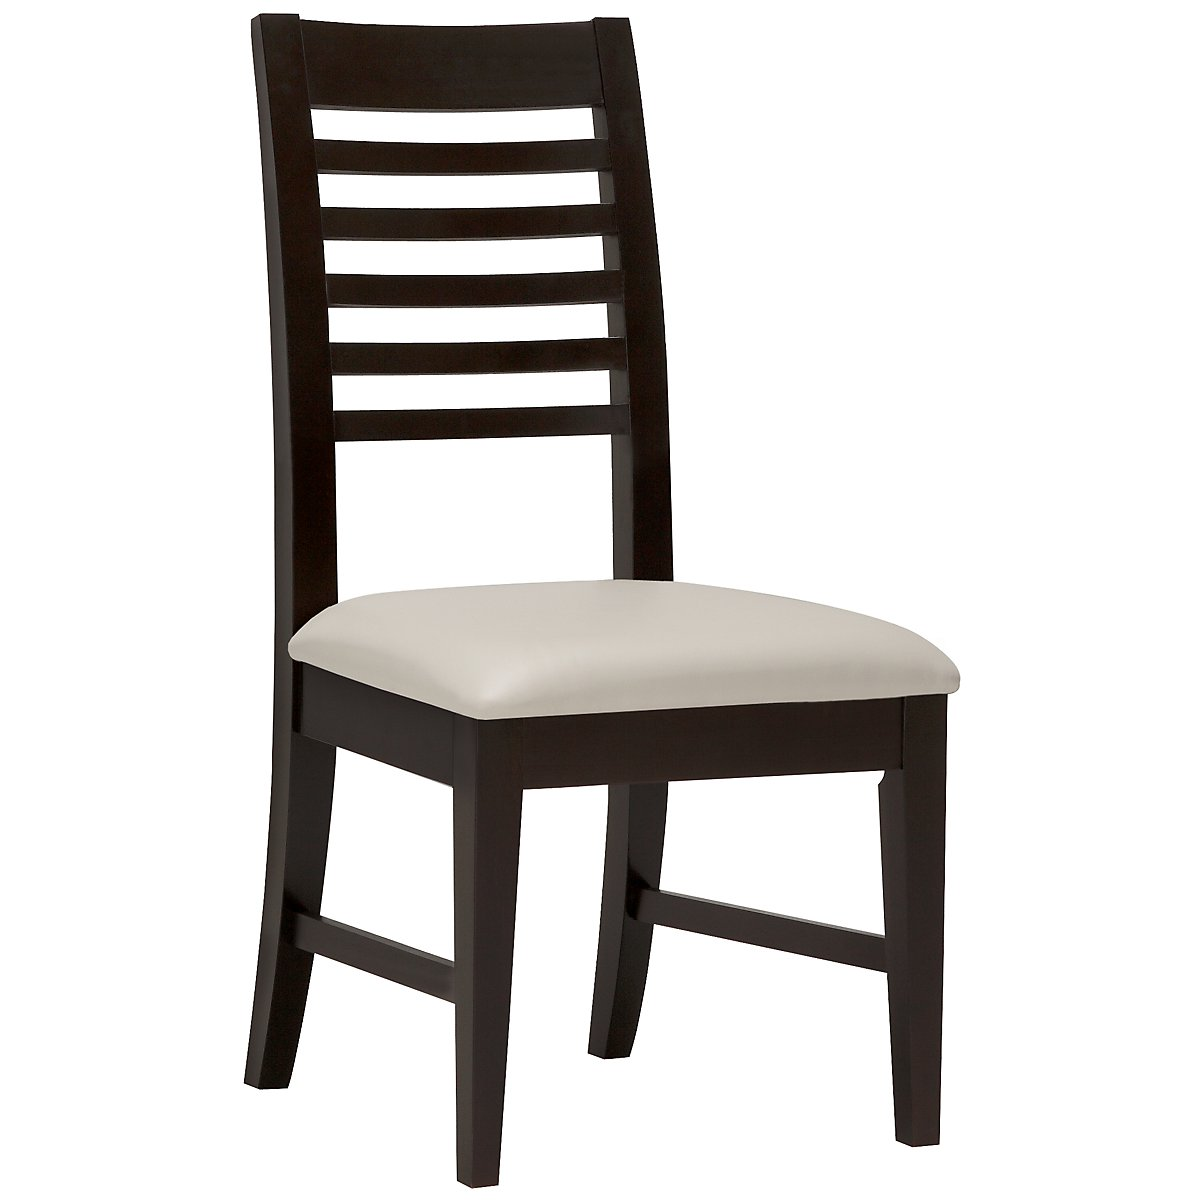 Encore2 Dark Tone Bonded Leather Slat Side Chair